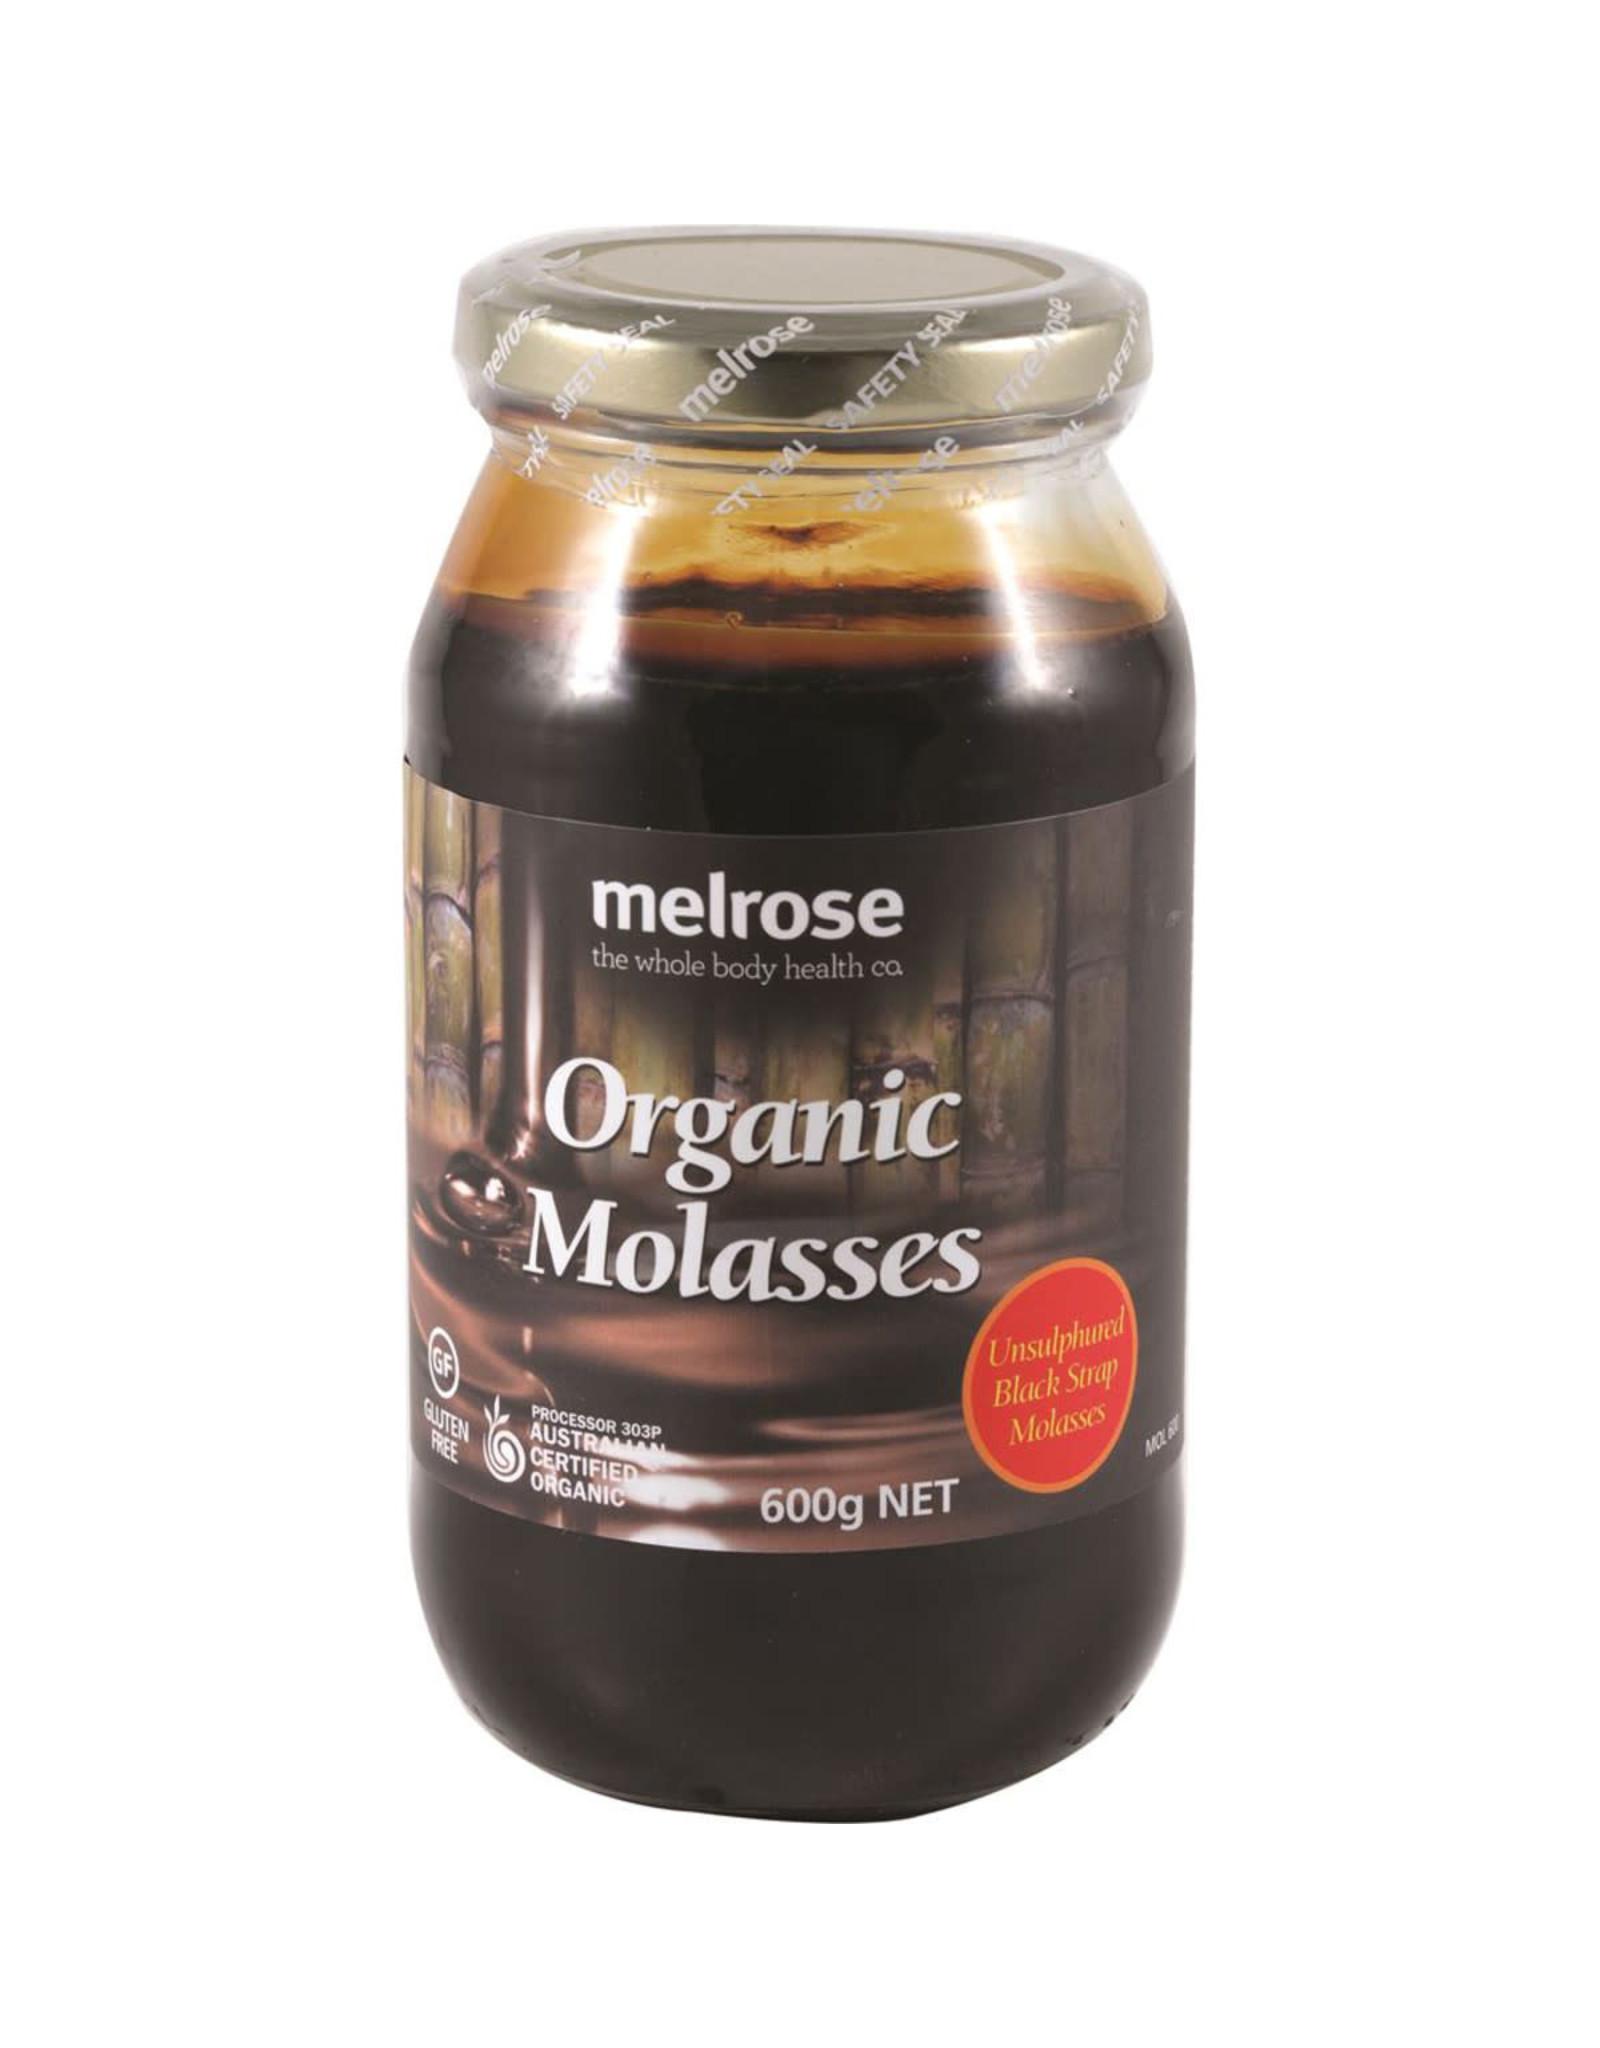 Melrose Organic Blackstrap Molasses 600g